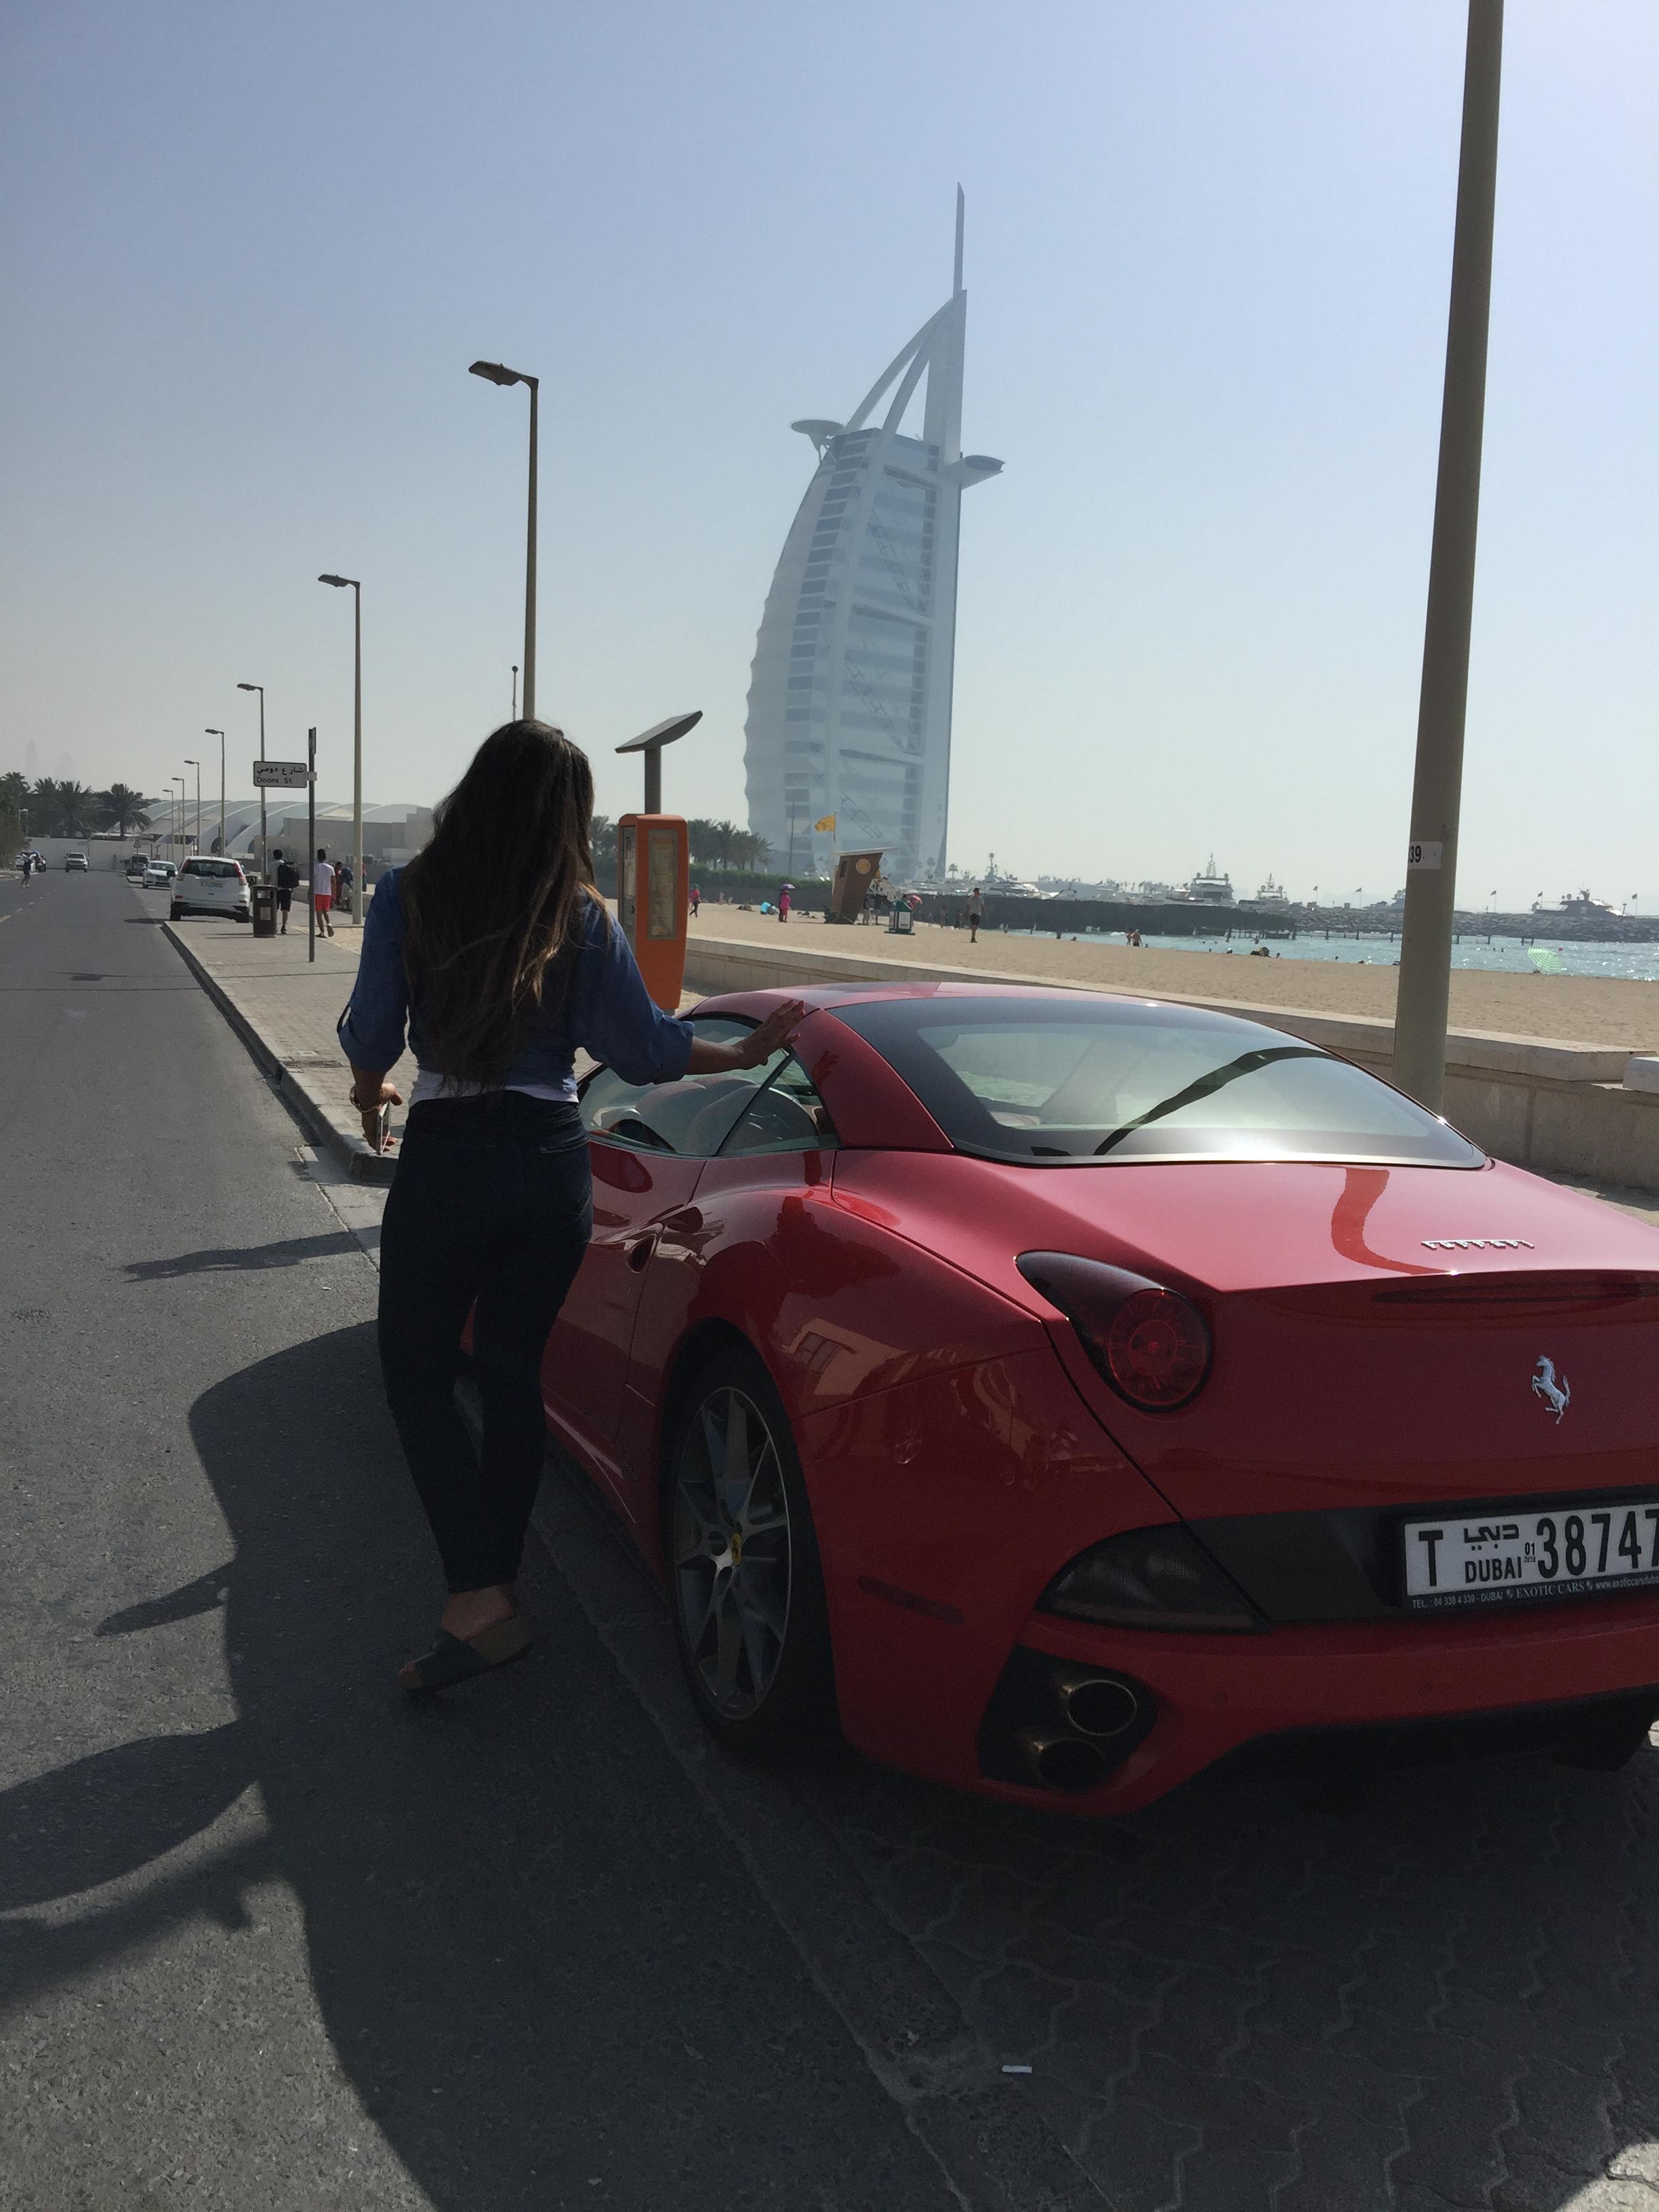 carla ferrari dubai burj khalifa room travel blogger influencer vlogger carla maria bruno advantures.jpg